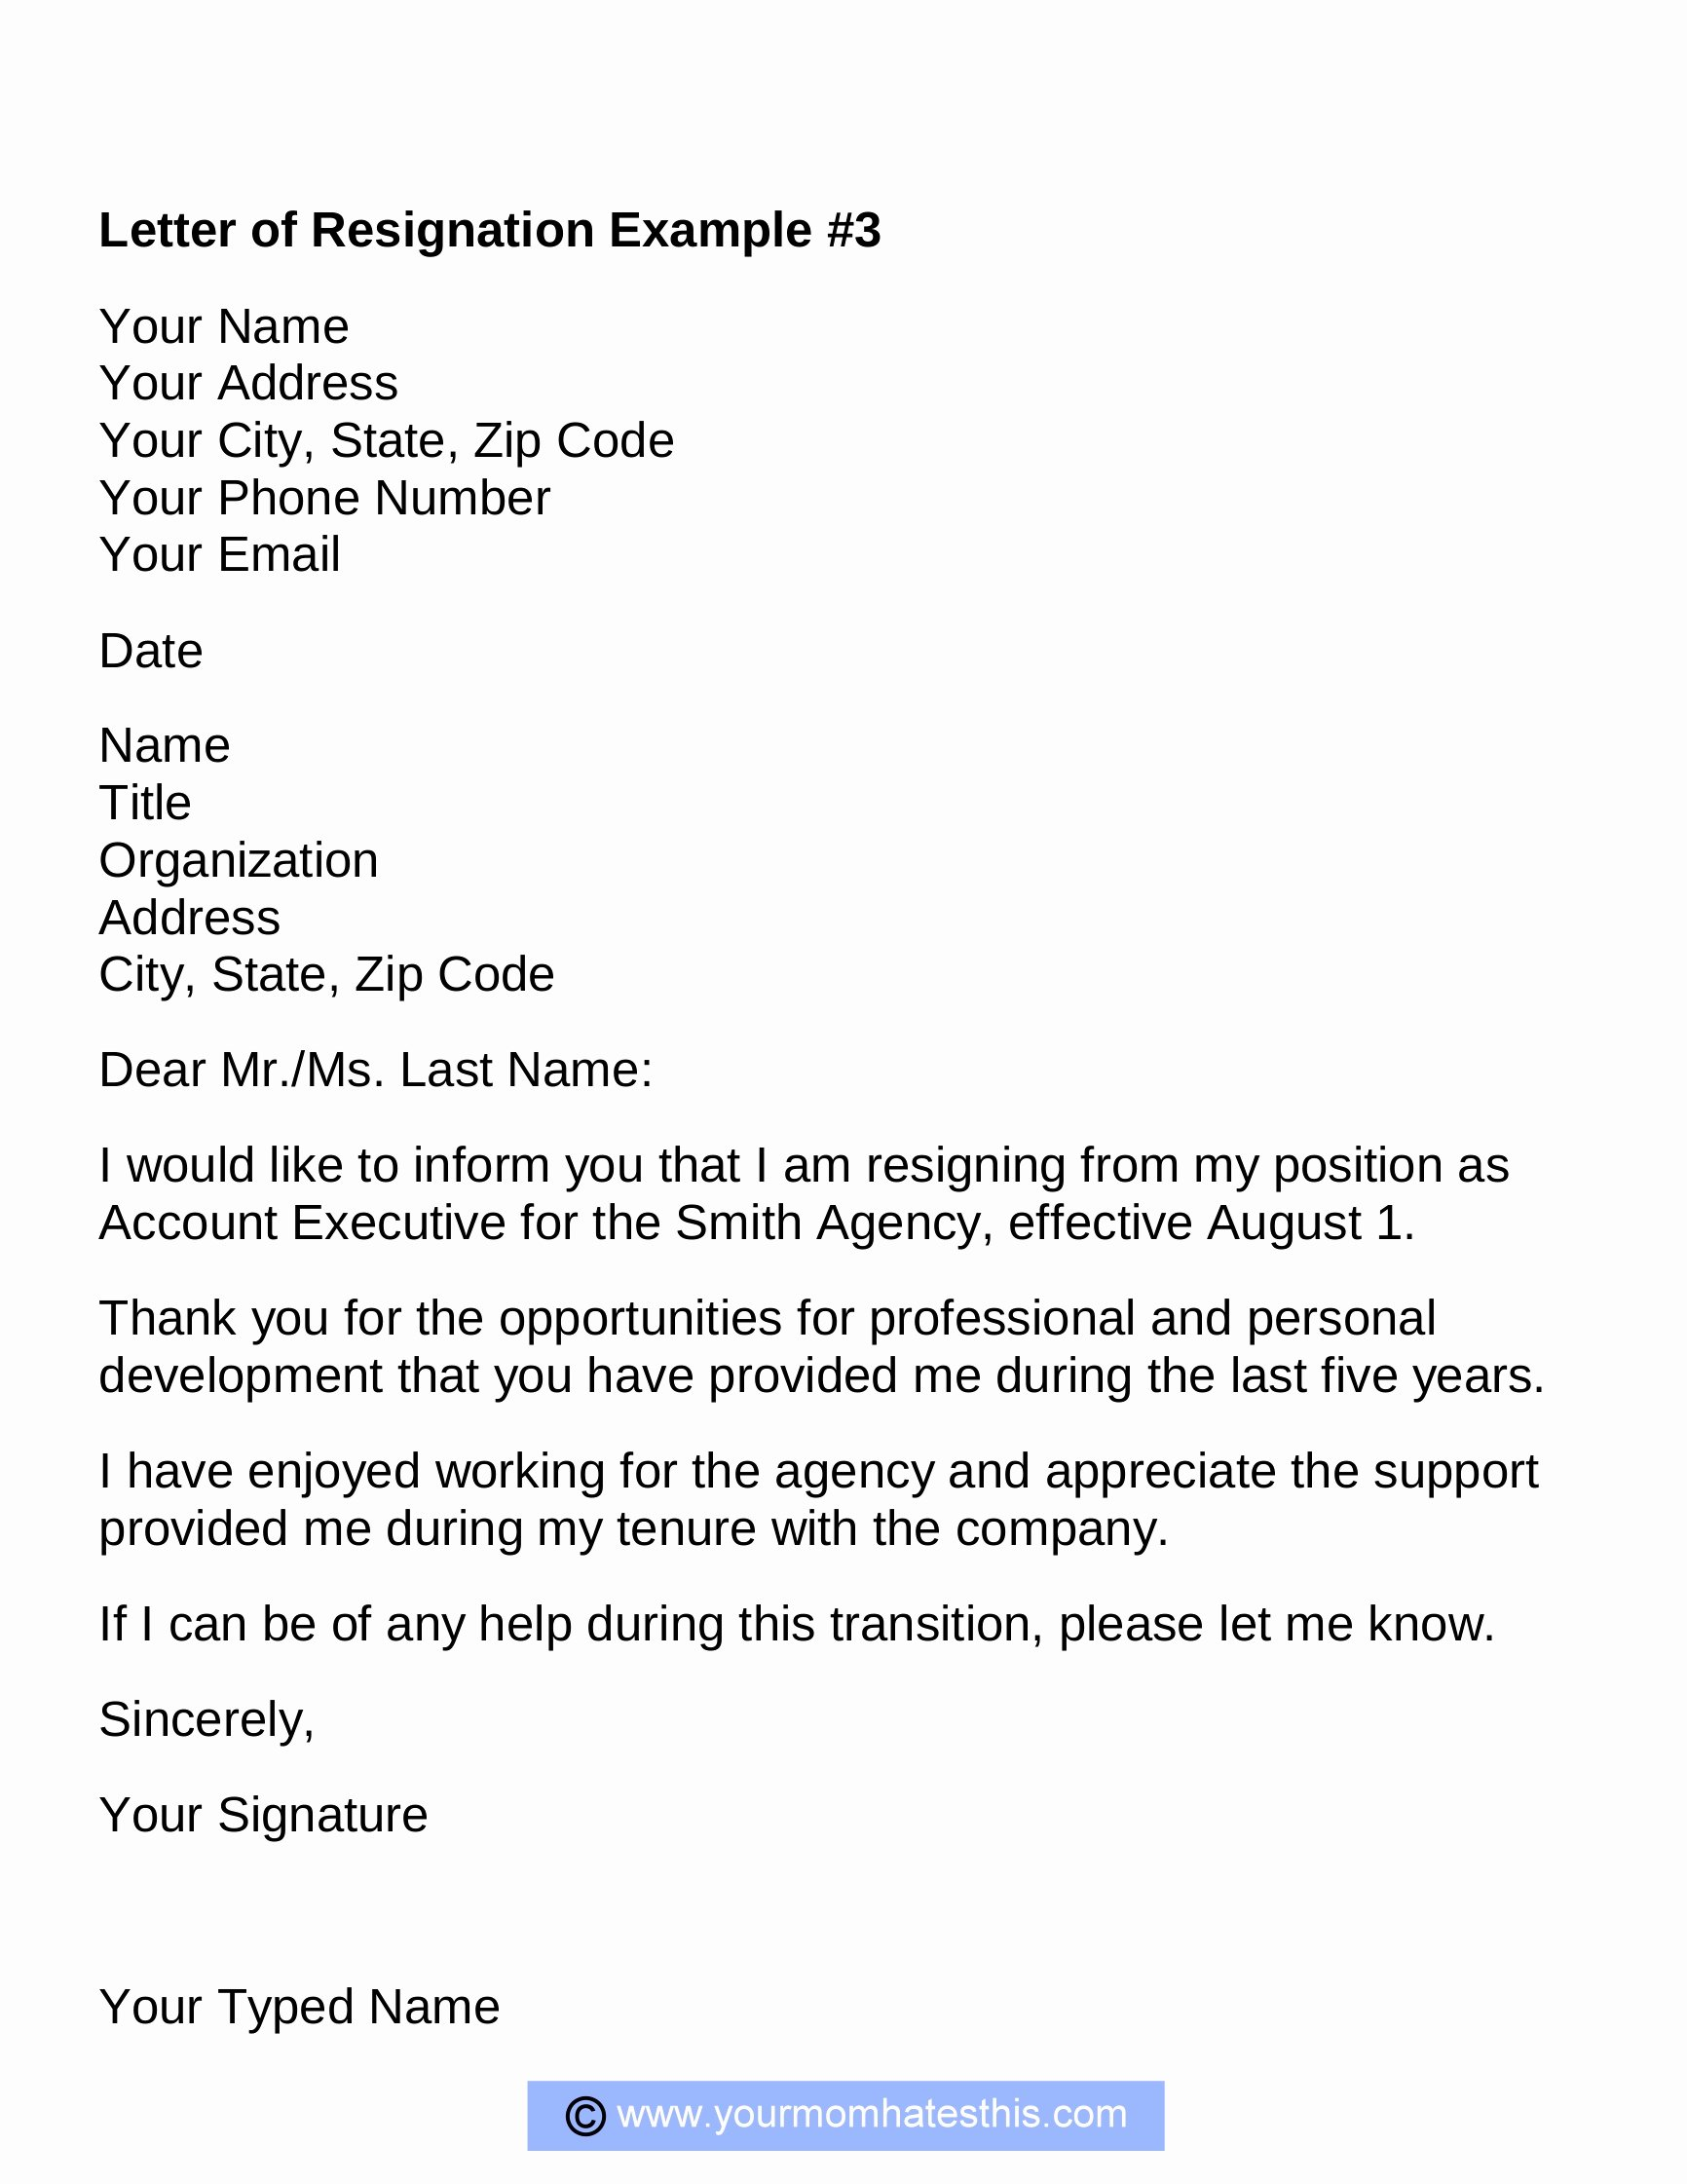 Formal Resignation Letters Sample Elegant Resignation Letter Samples Download Pdf Doc format